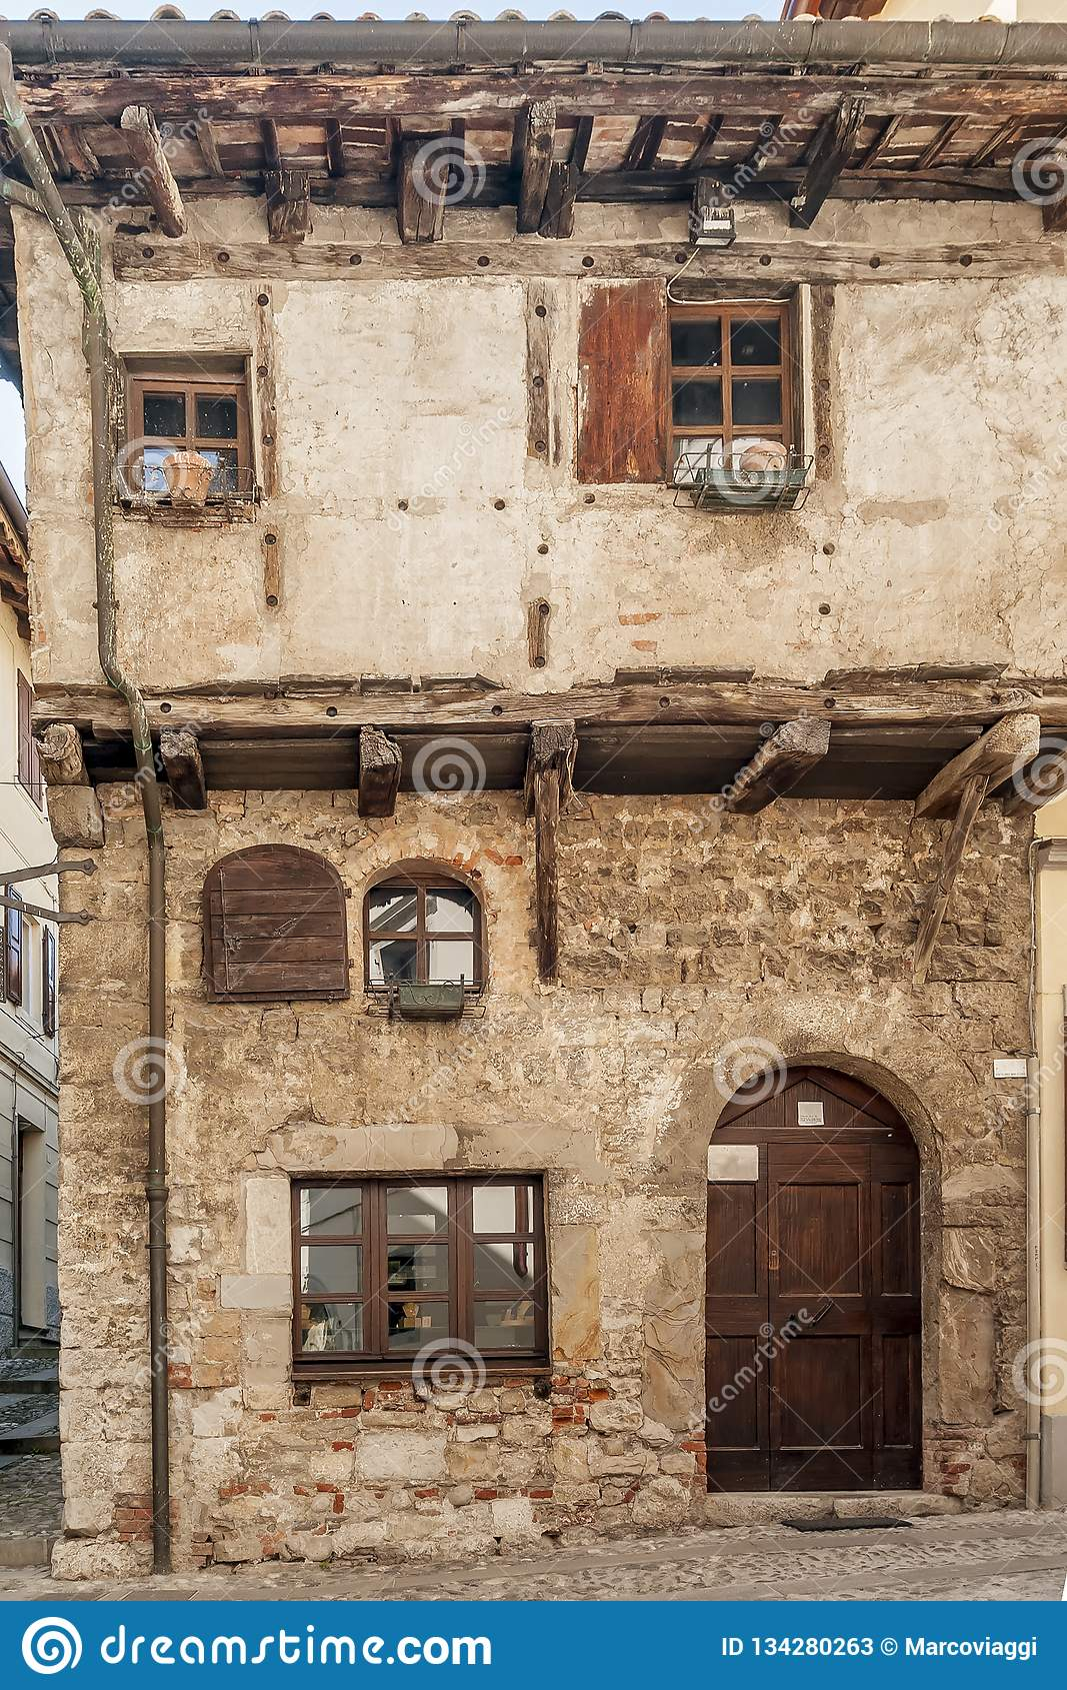 Casa medieval típica de Italia septentrional en Cividale del Friuli, Udine, Friuli Venezia Julia, Italia